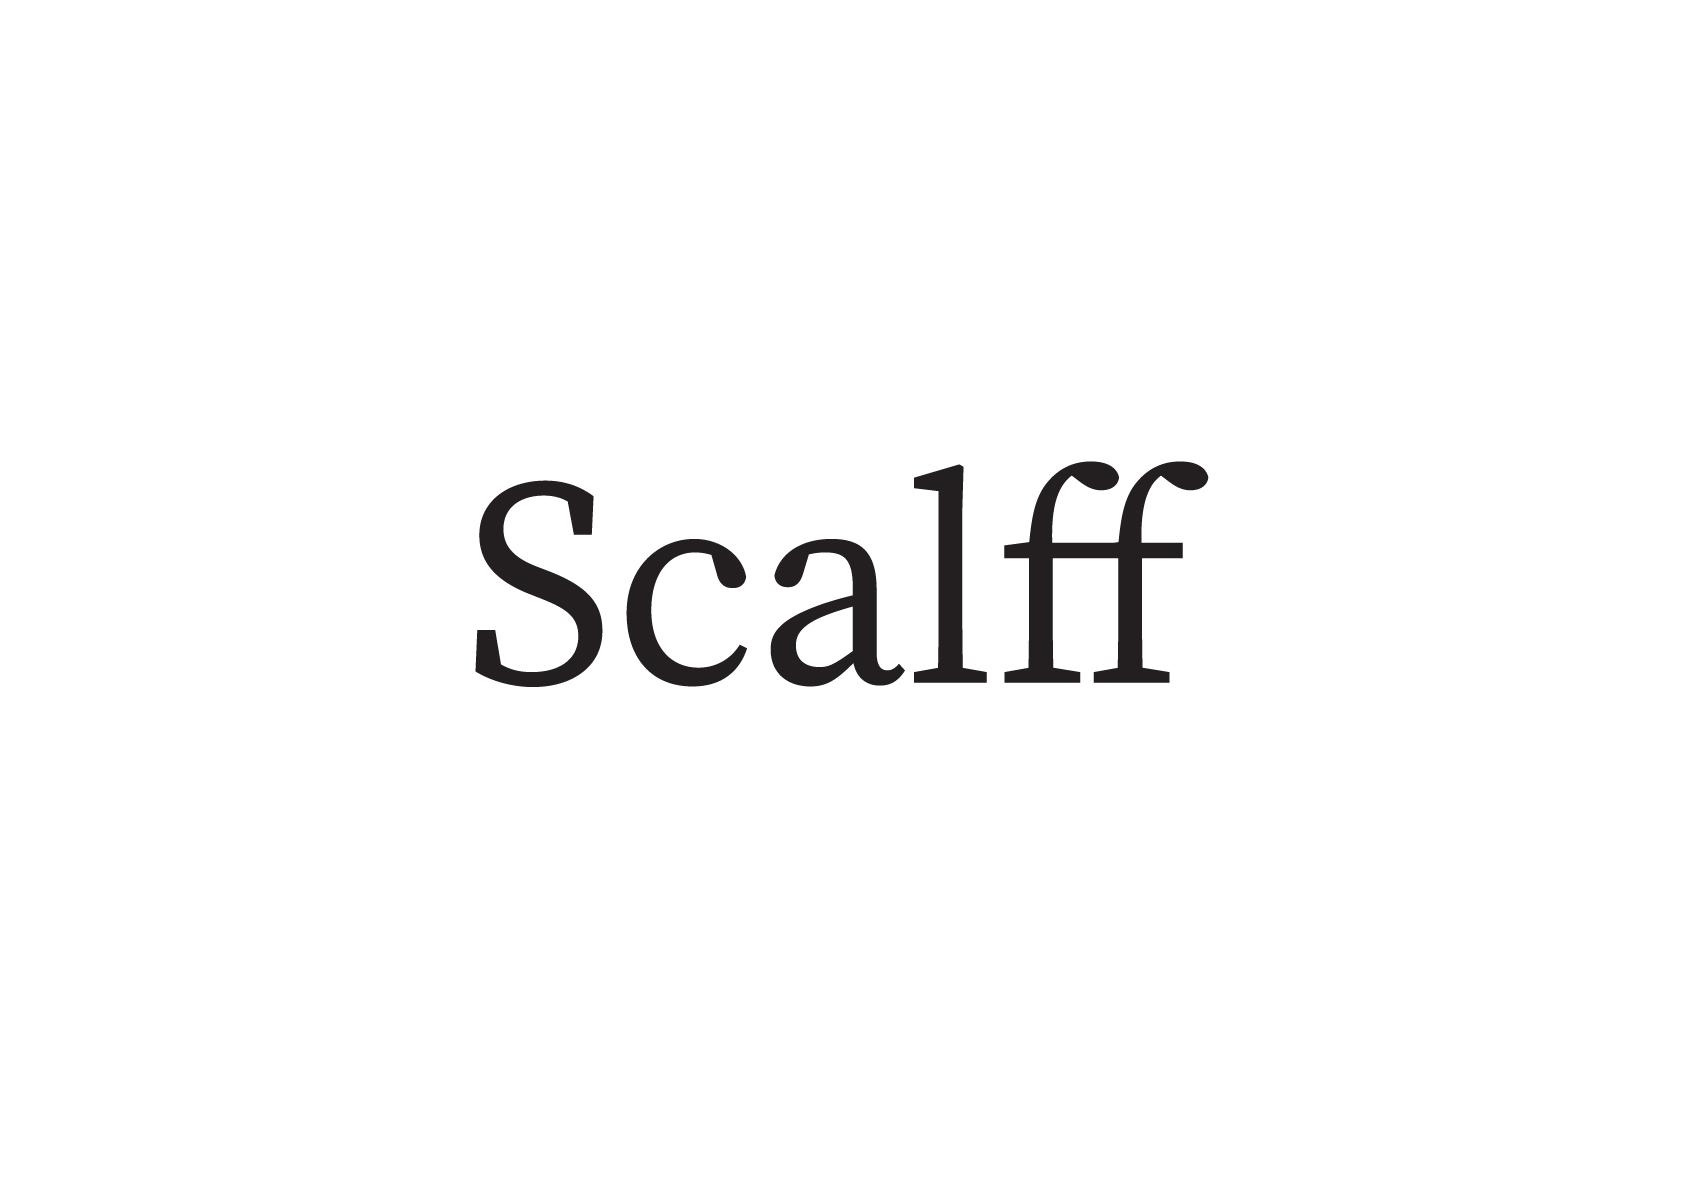 scalff2